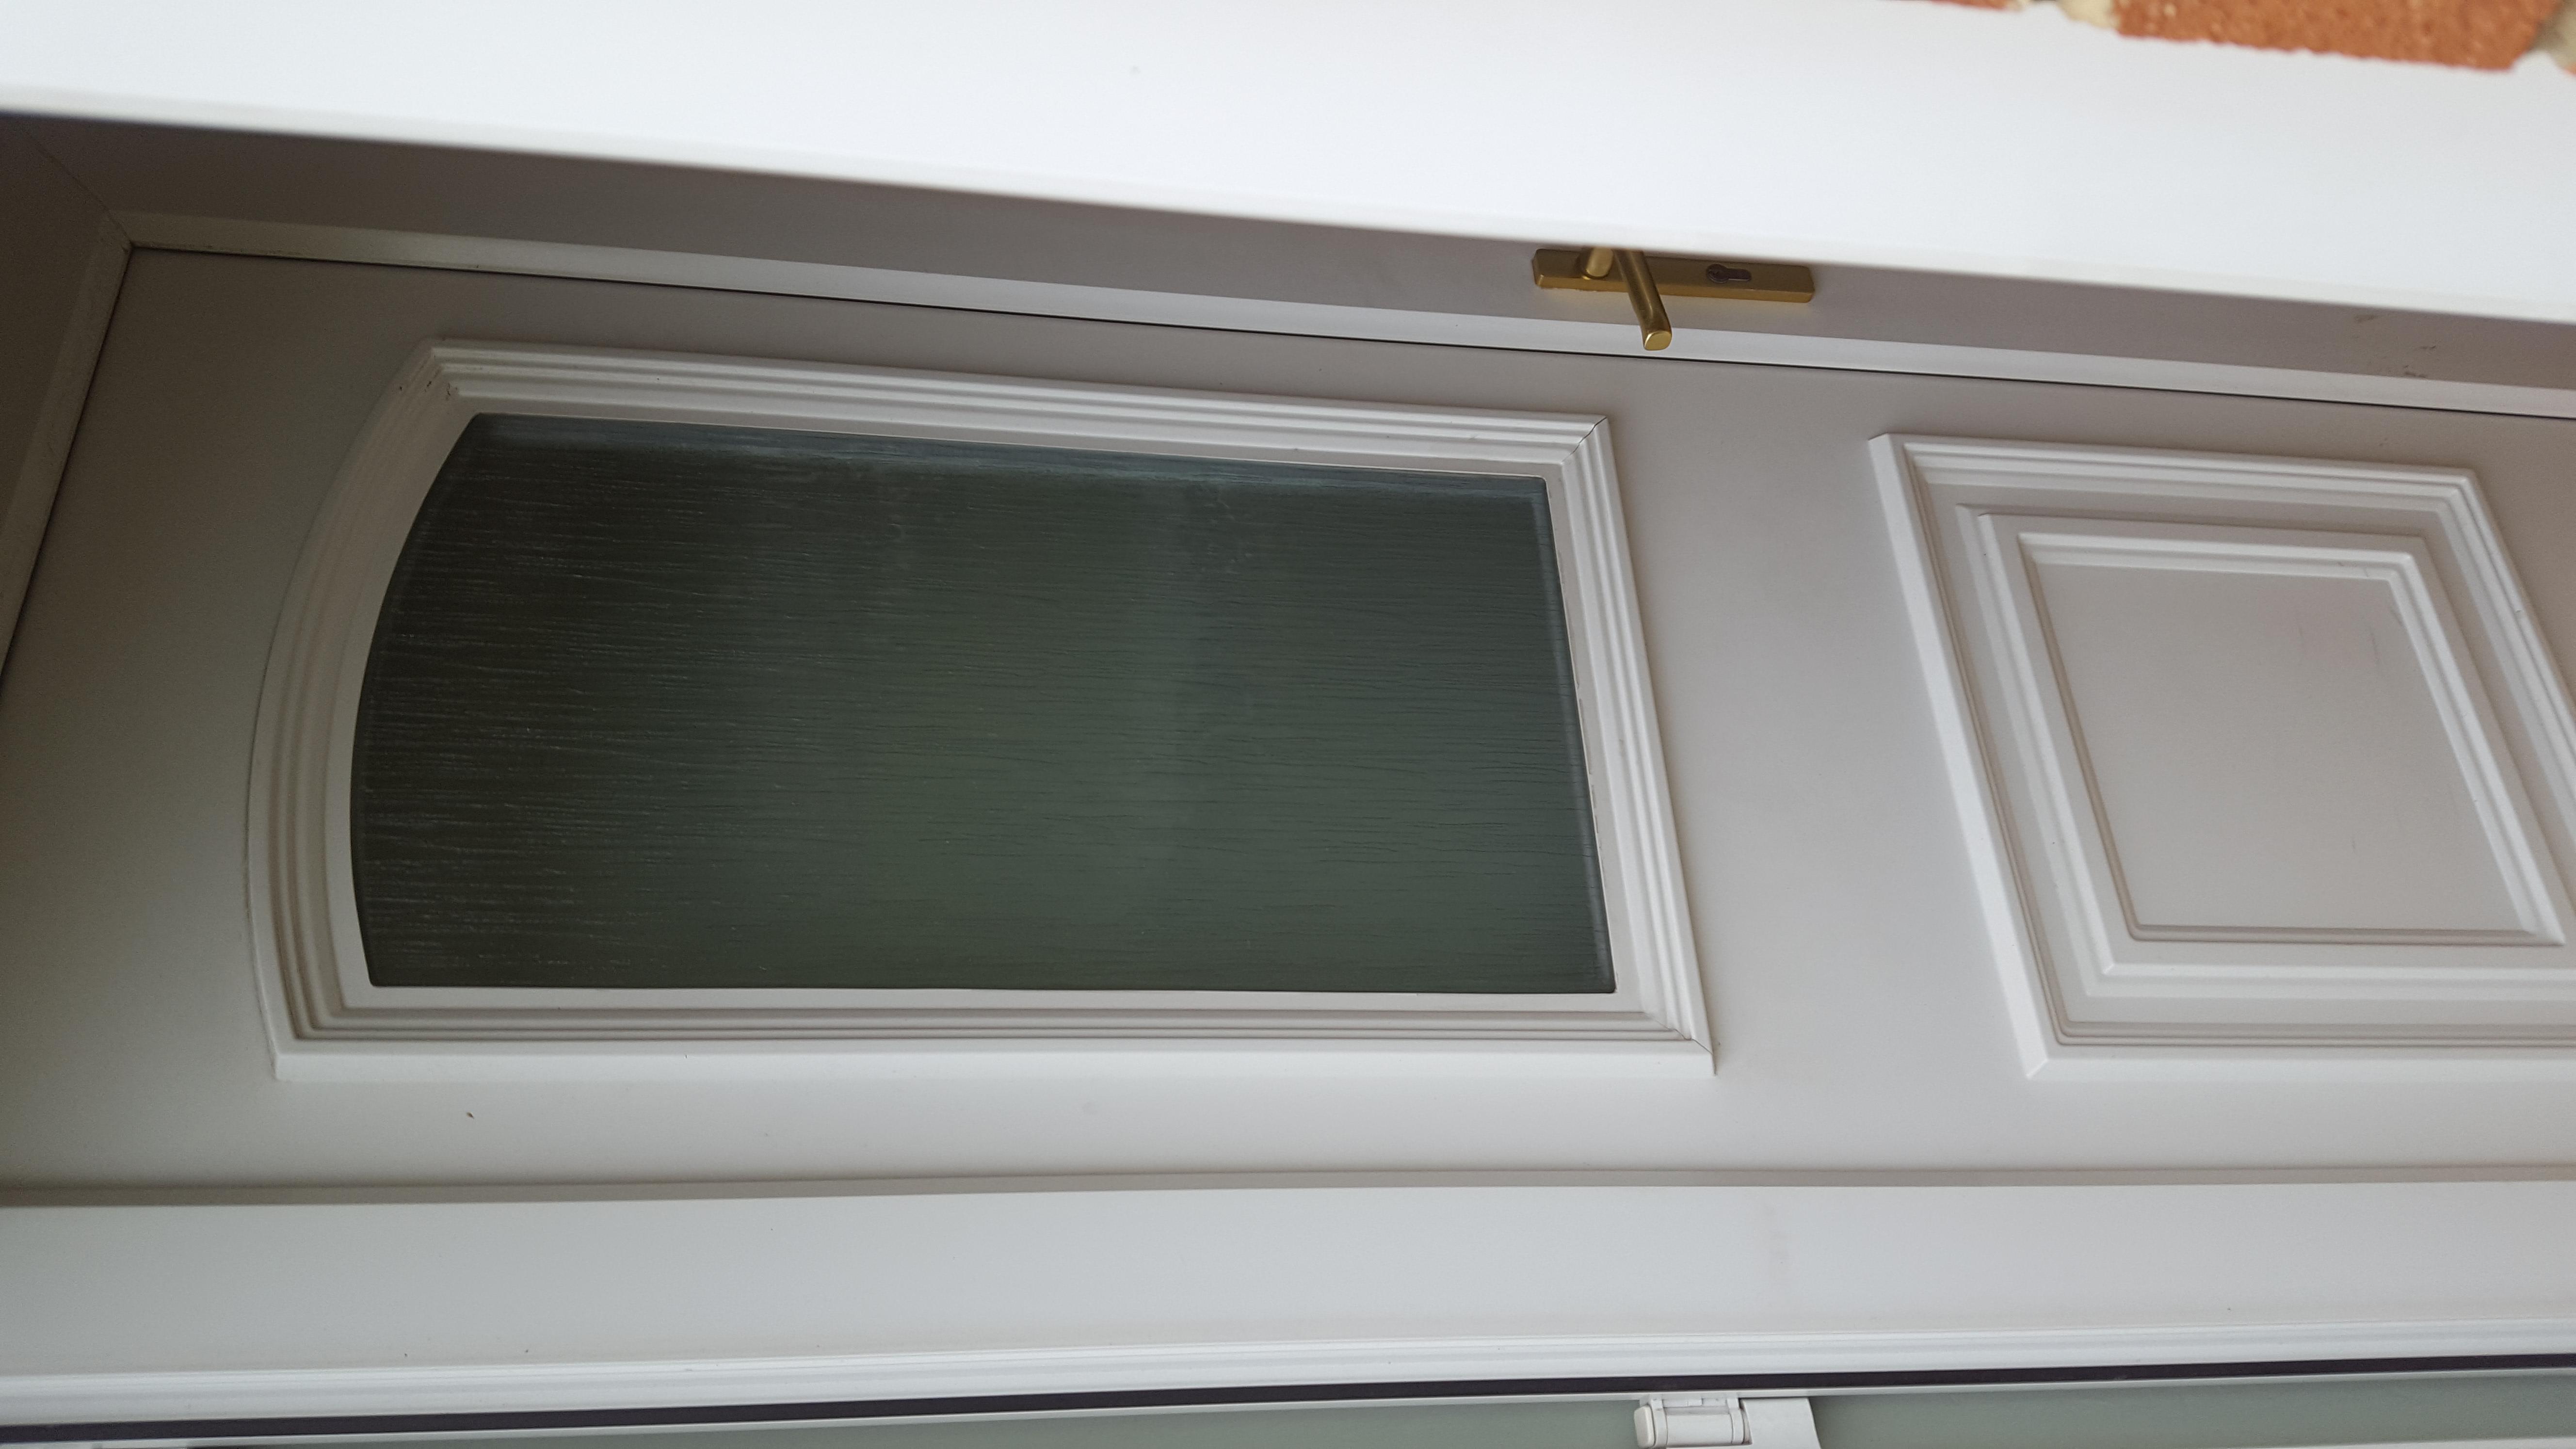 Upvc door panel replaced in whitley bay 1 double for Upvc window repairs